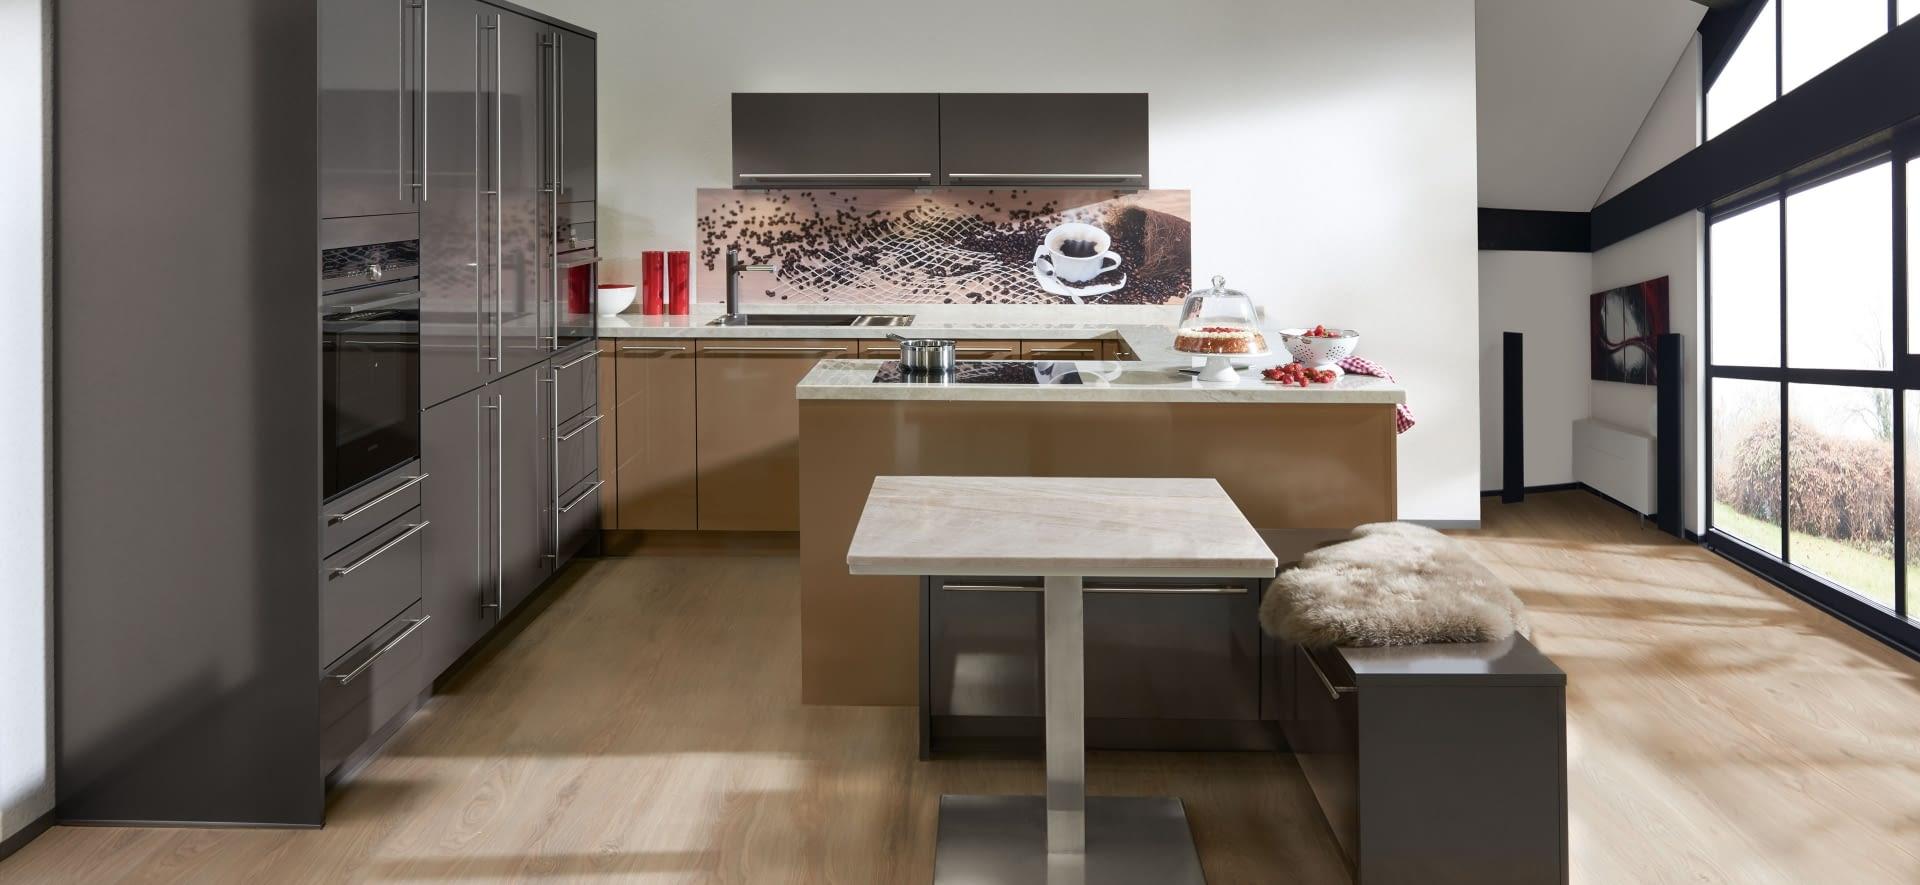 klassische u k che glanzquarzgold mit taj mahal marquardt k chen. Black Bedroom Furniture Sets. Home Design Ideas